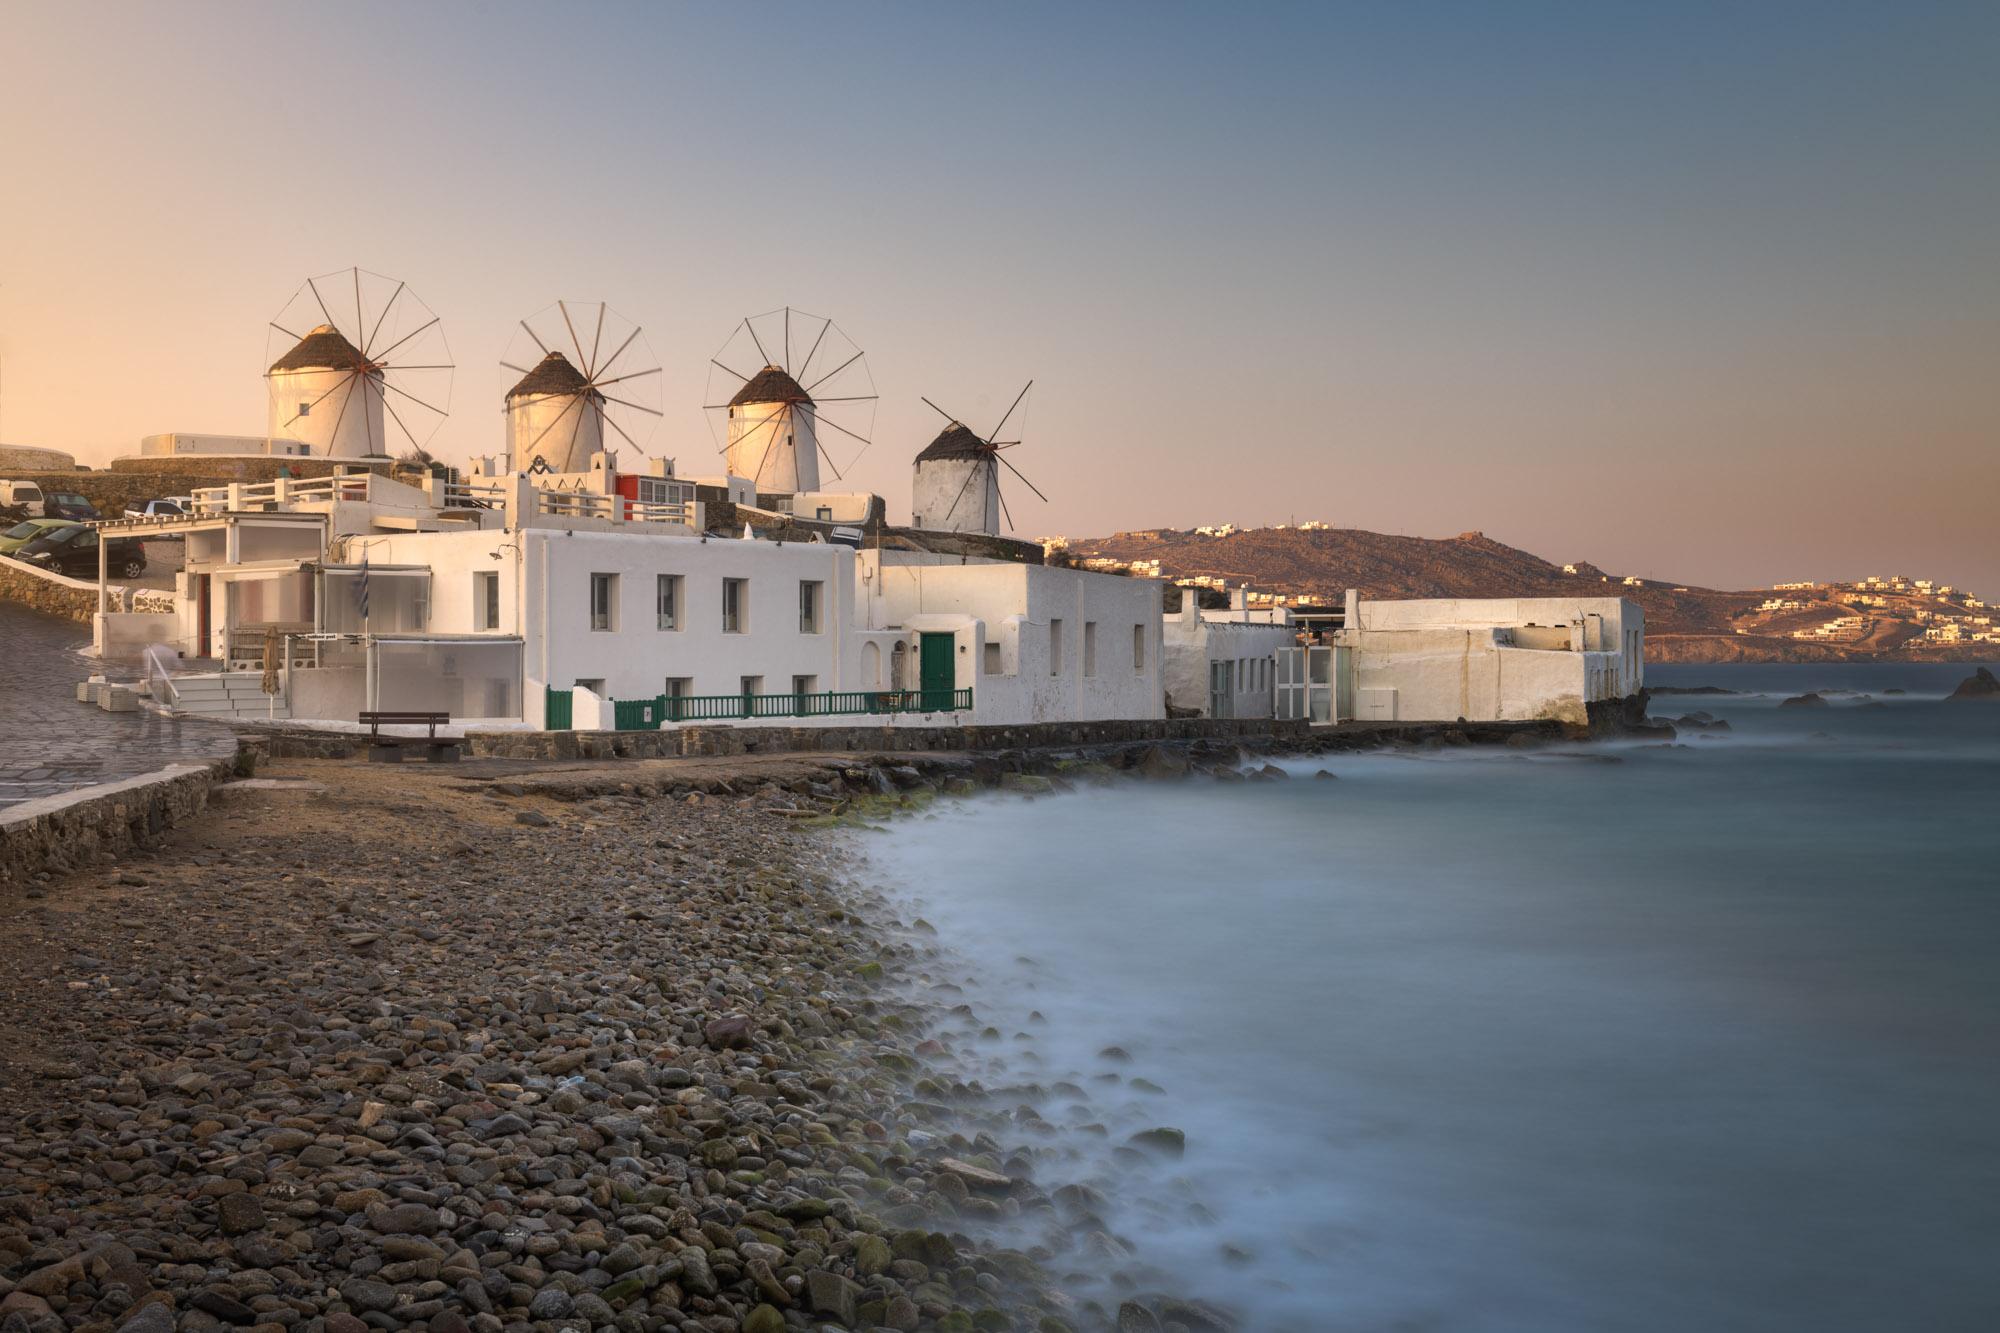 Old Windmills in Chora, Mykonos, Greece